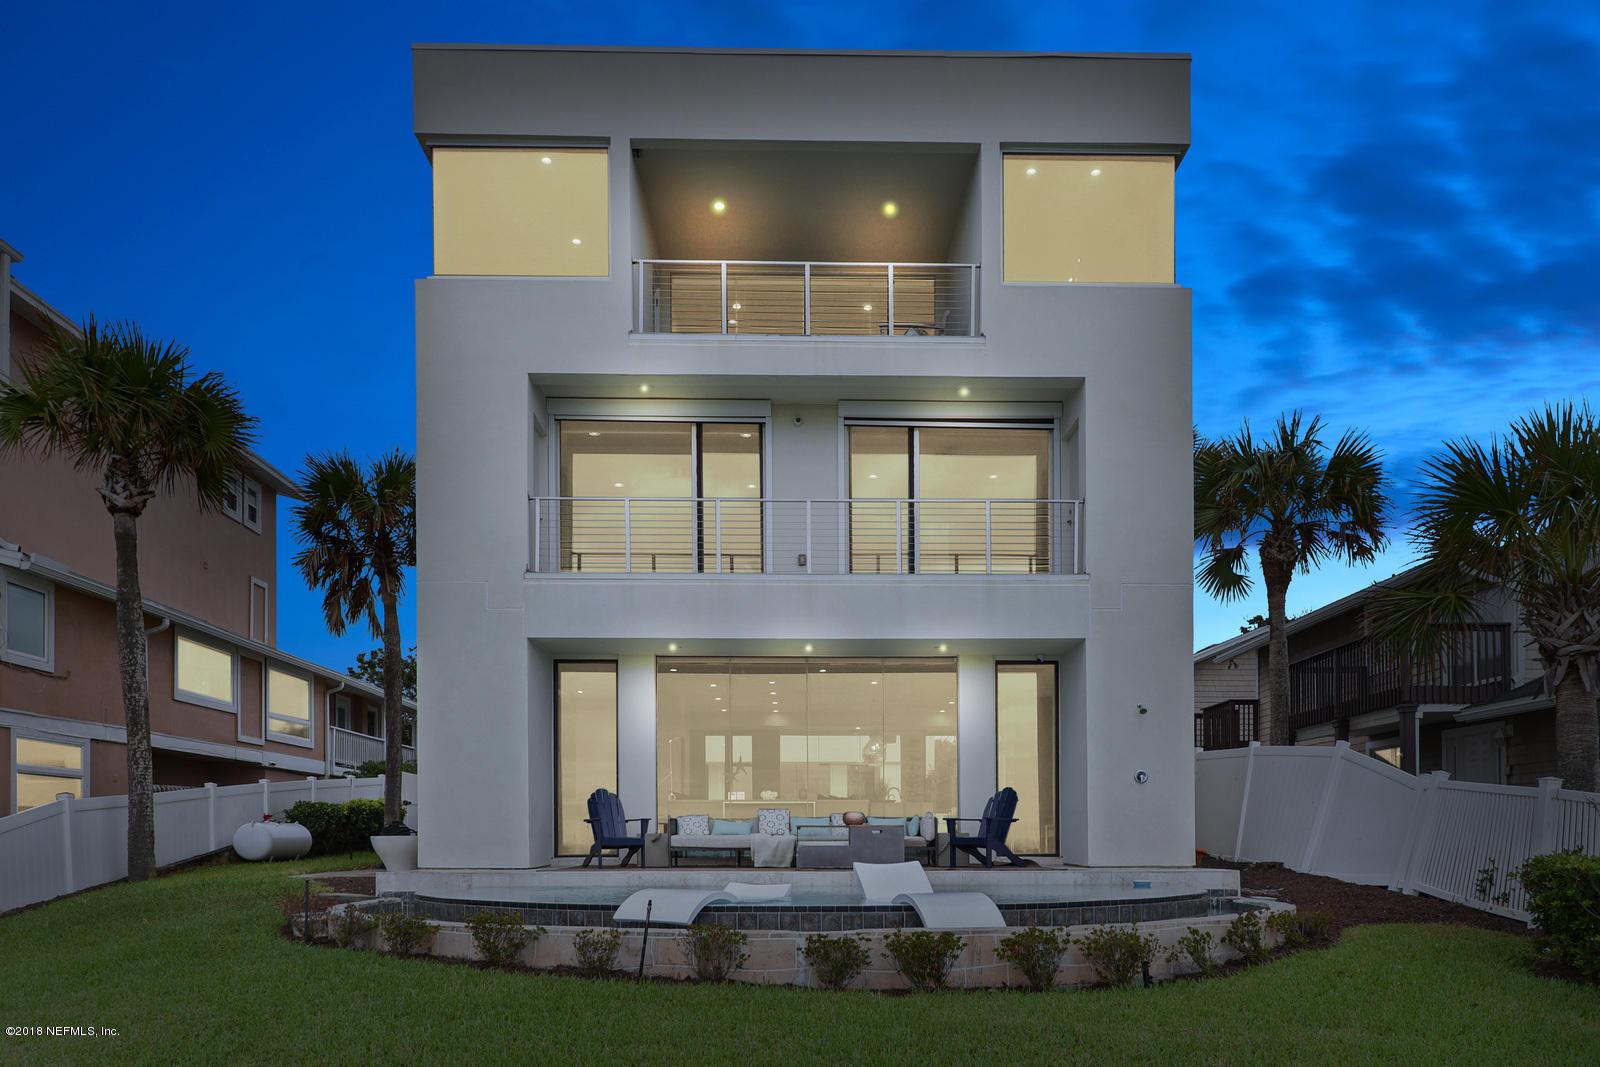 1777 BEACH, ATLANTIC BEACH, FLORIDA 32233, 4 Bedrooms Bedrooms, ,5 BathroomsBathrooms,Residential - single family,For sale,BEACH,964464